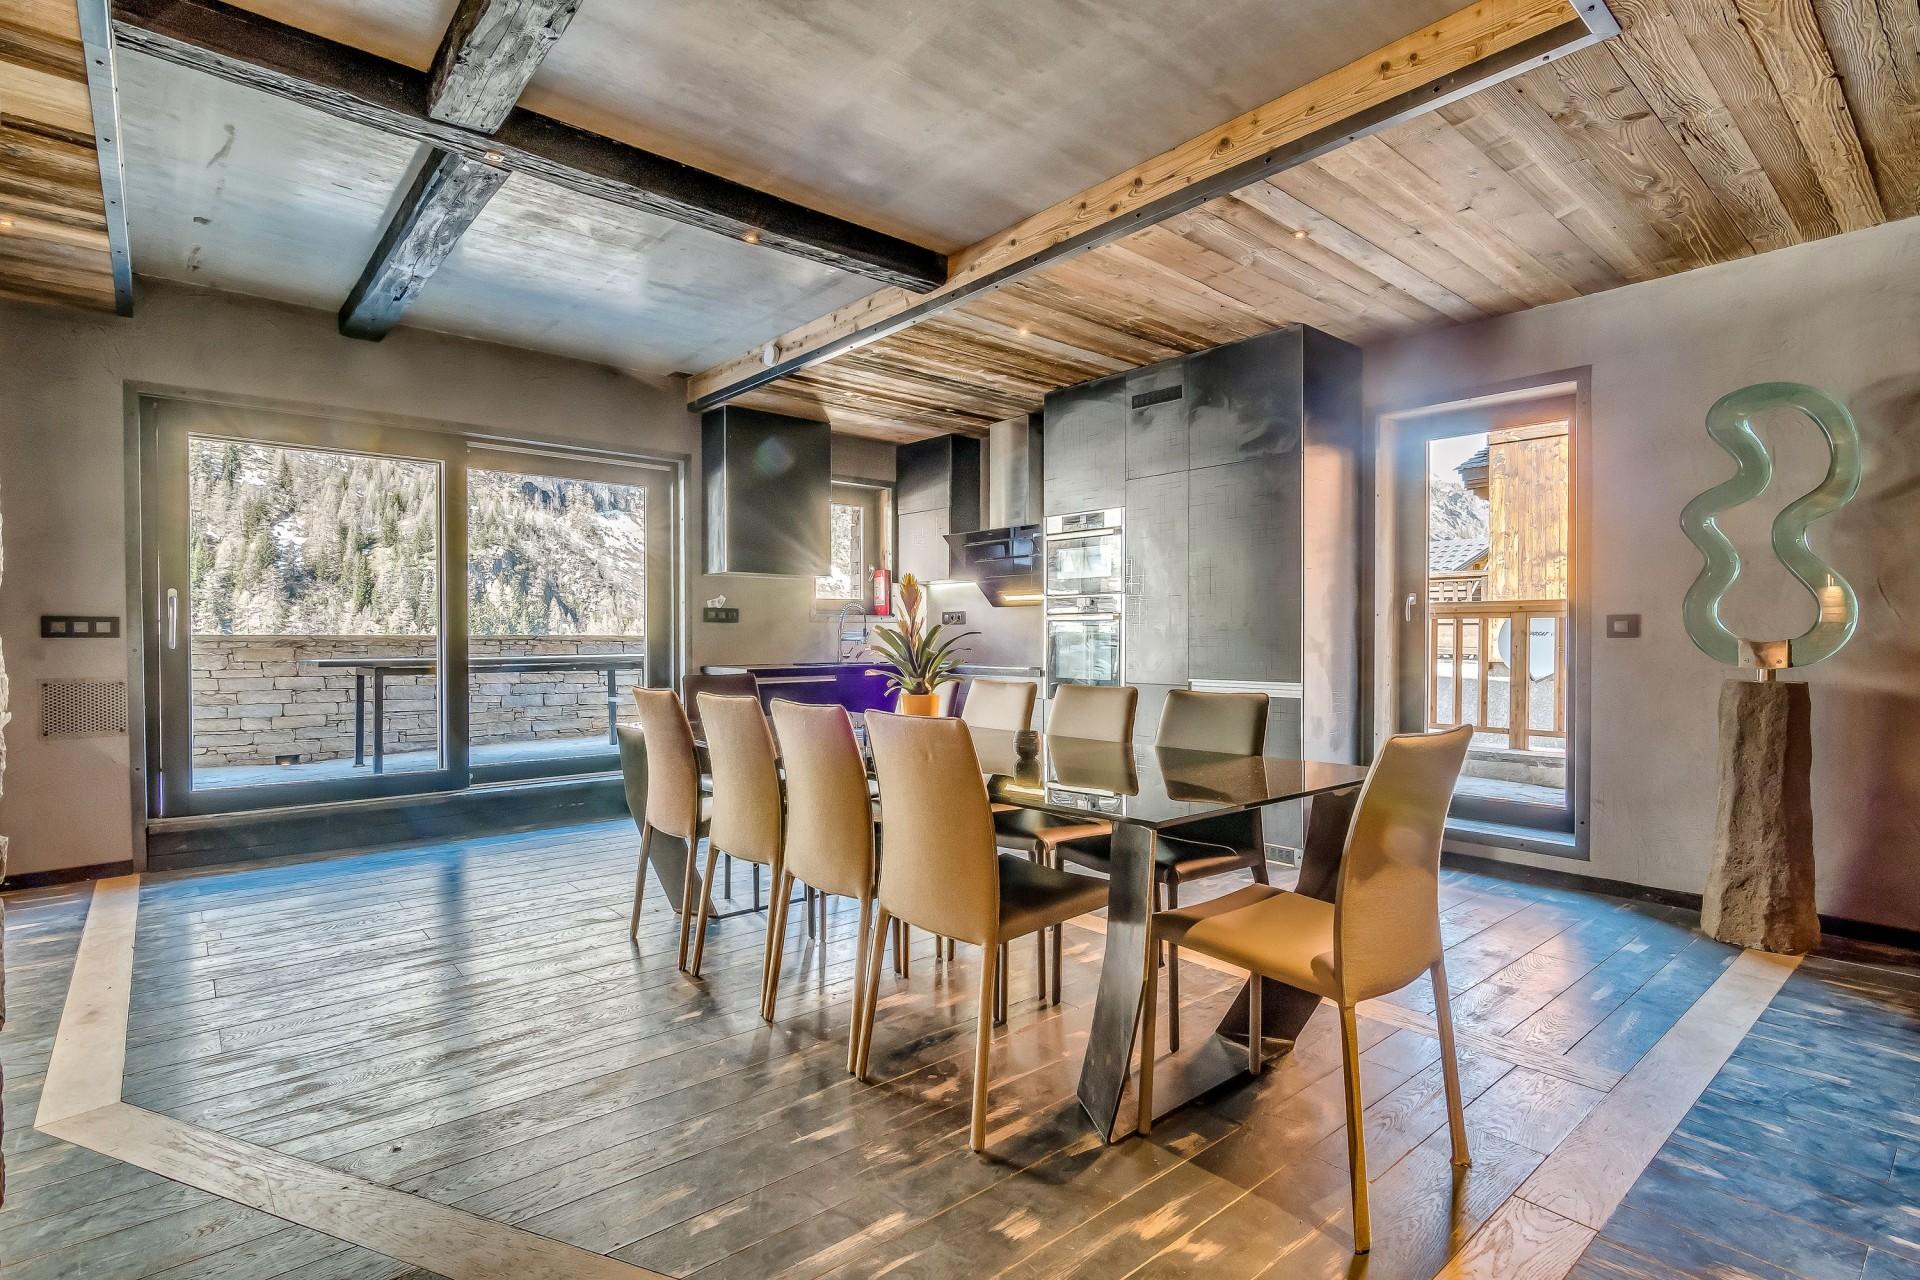 Tignes Location Chalet Luxe Tavanite Table A Manger